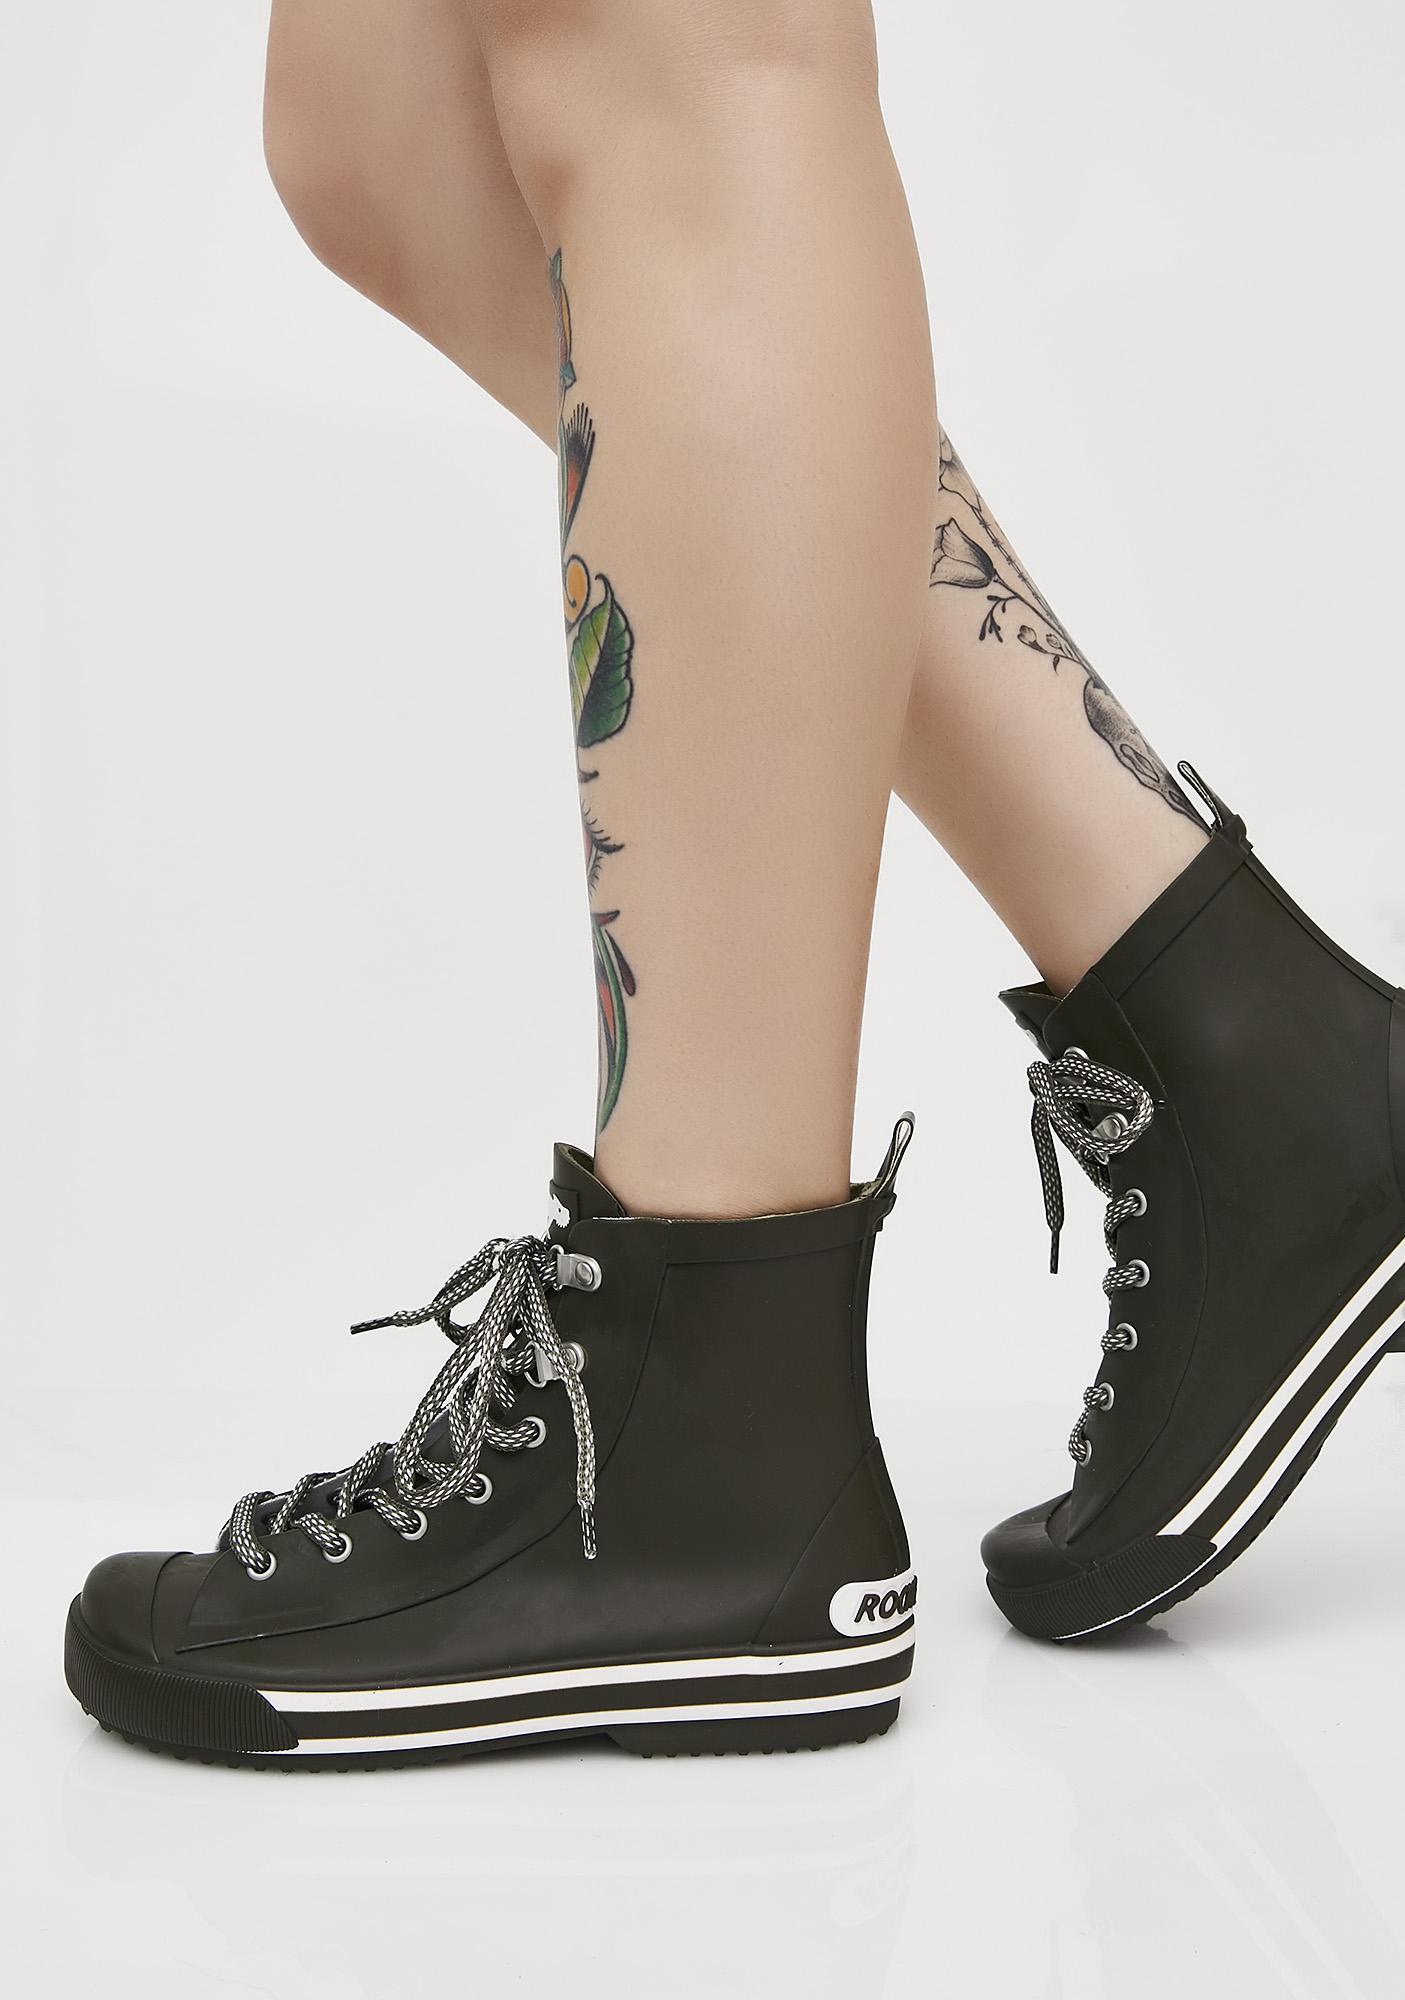 Rocket Dog Rainy Sneaker Rain Boots